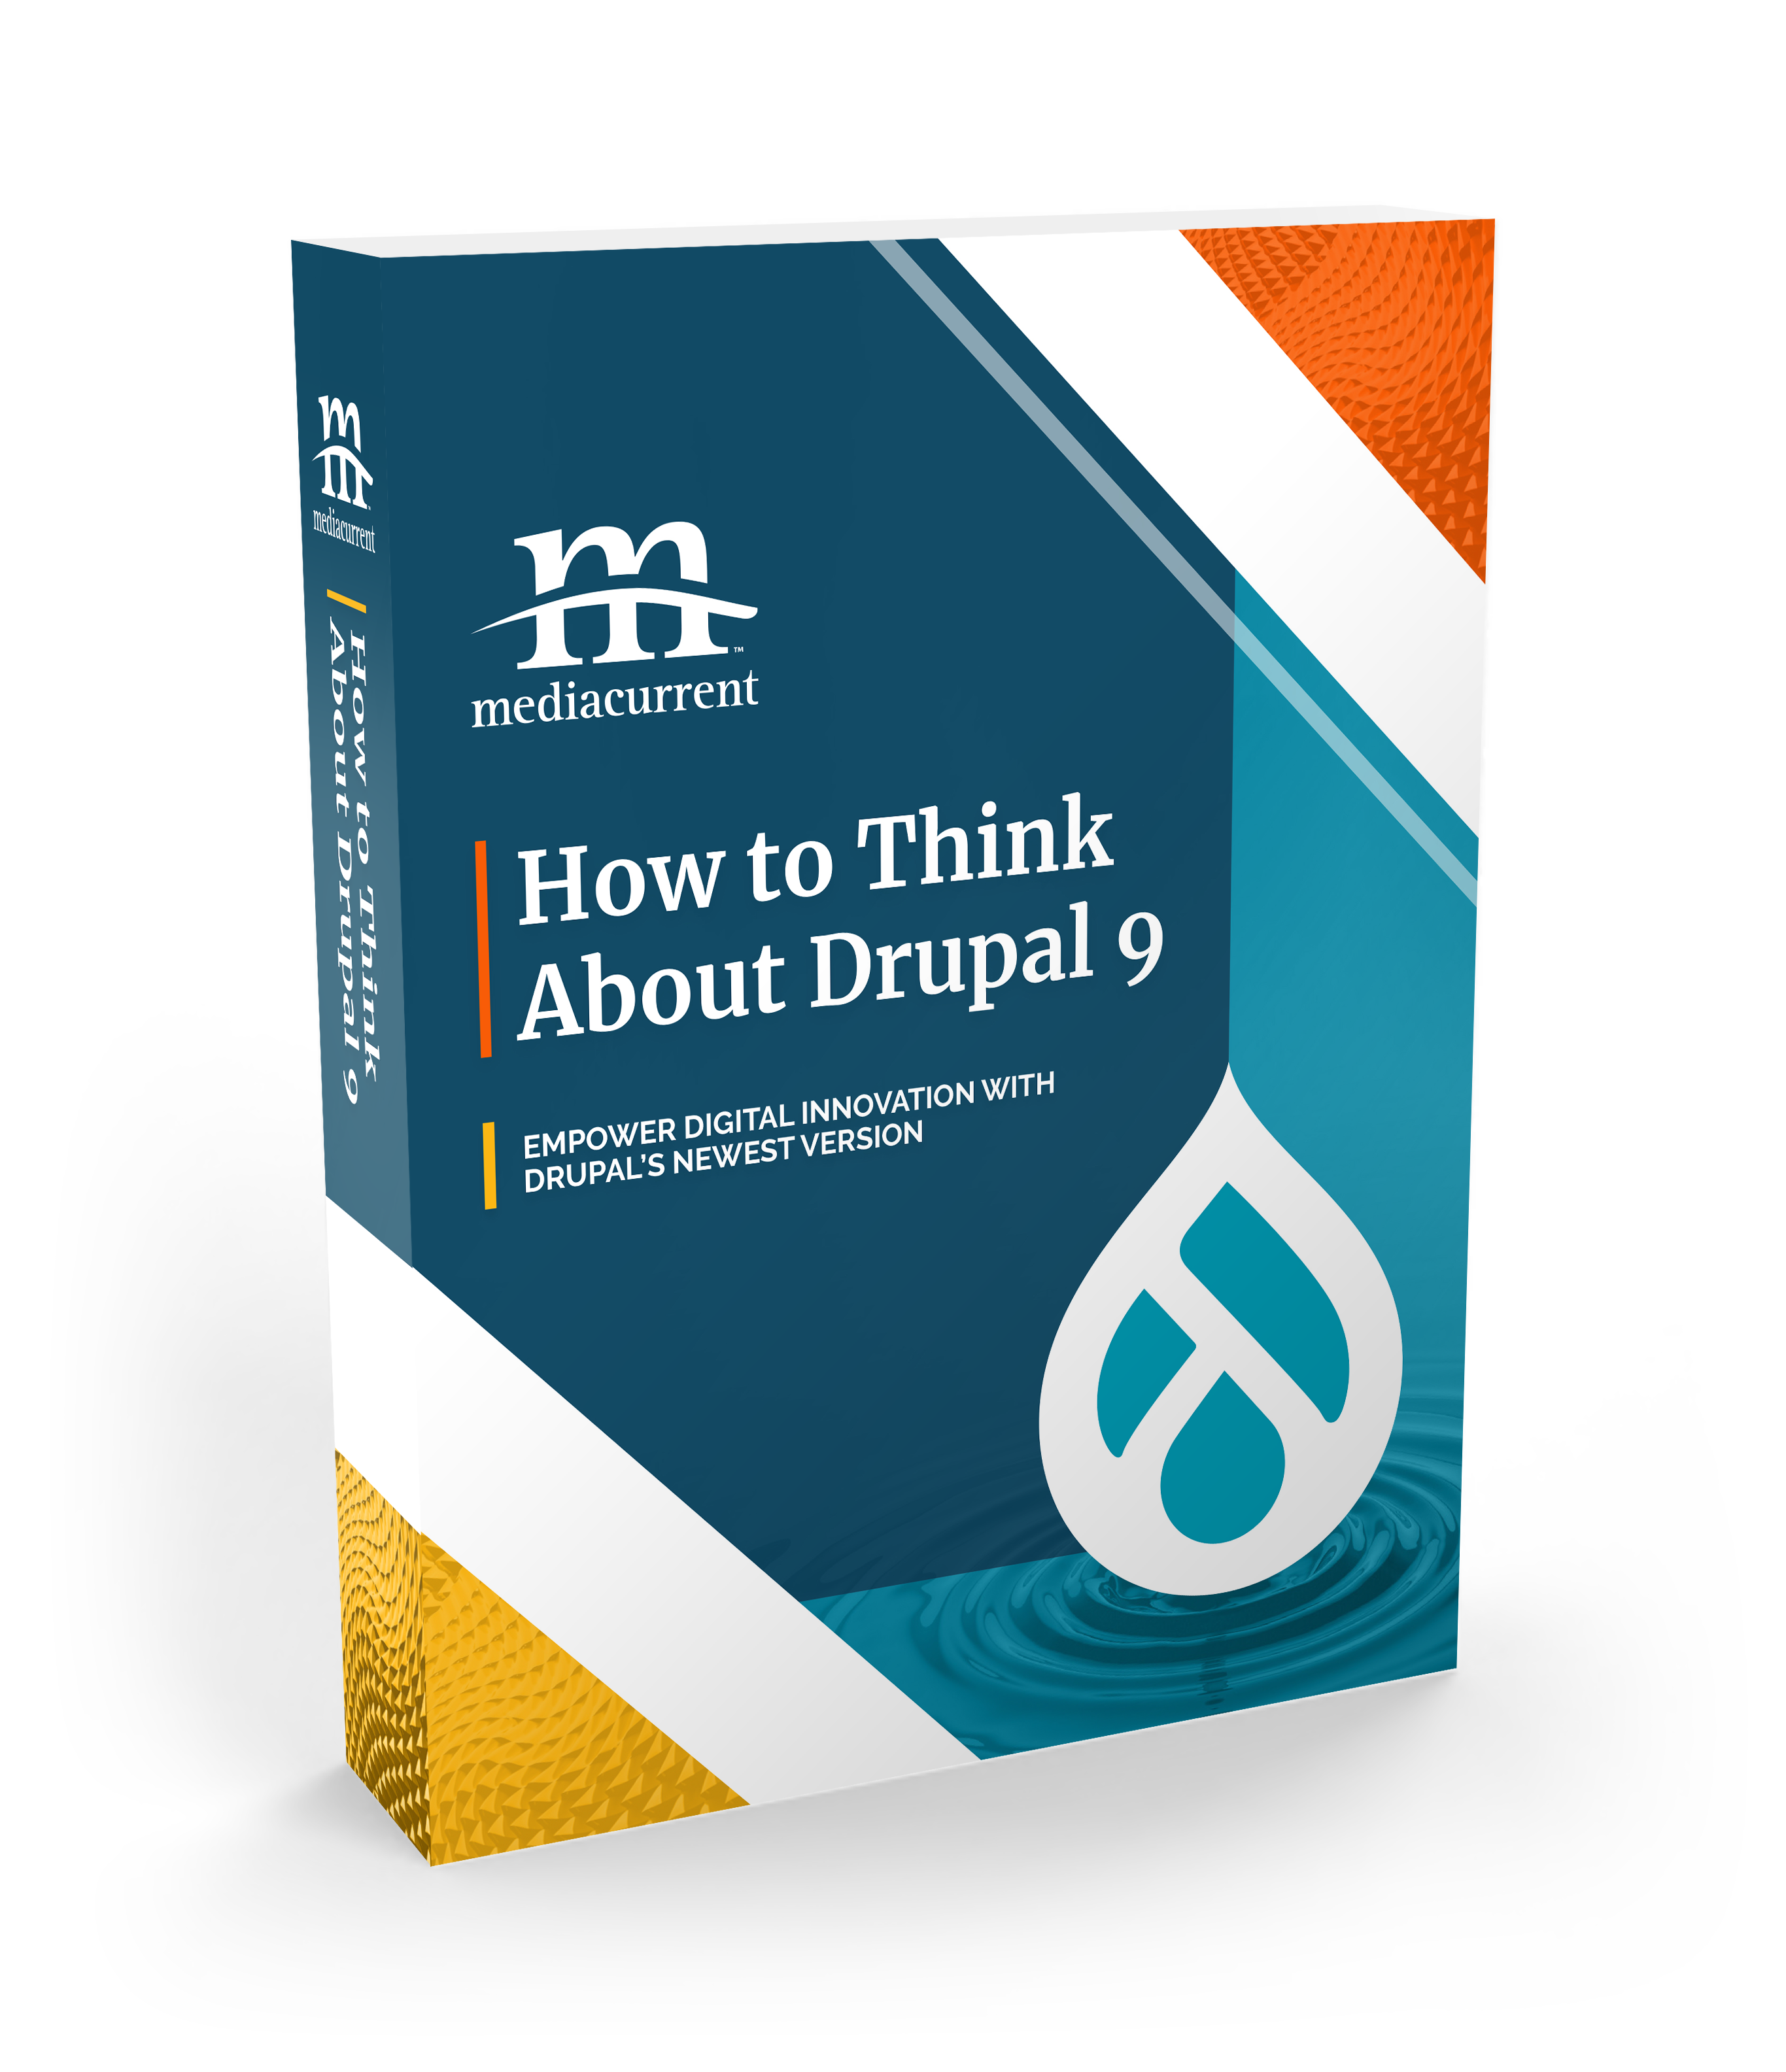 drupal 9 ebook